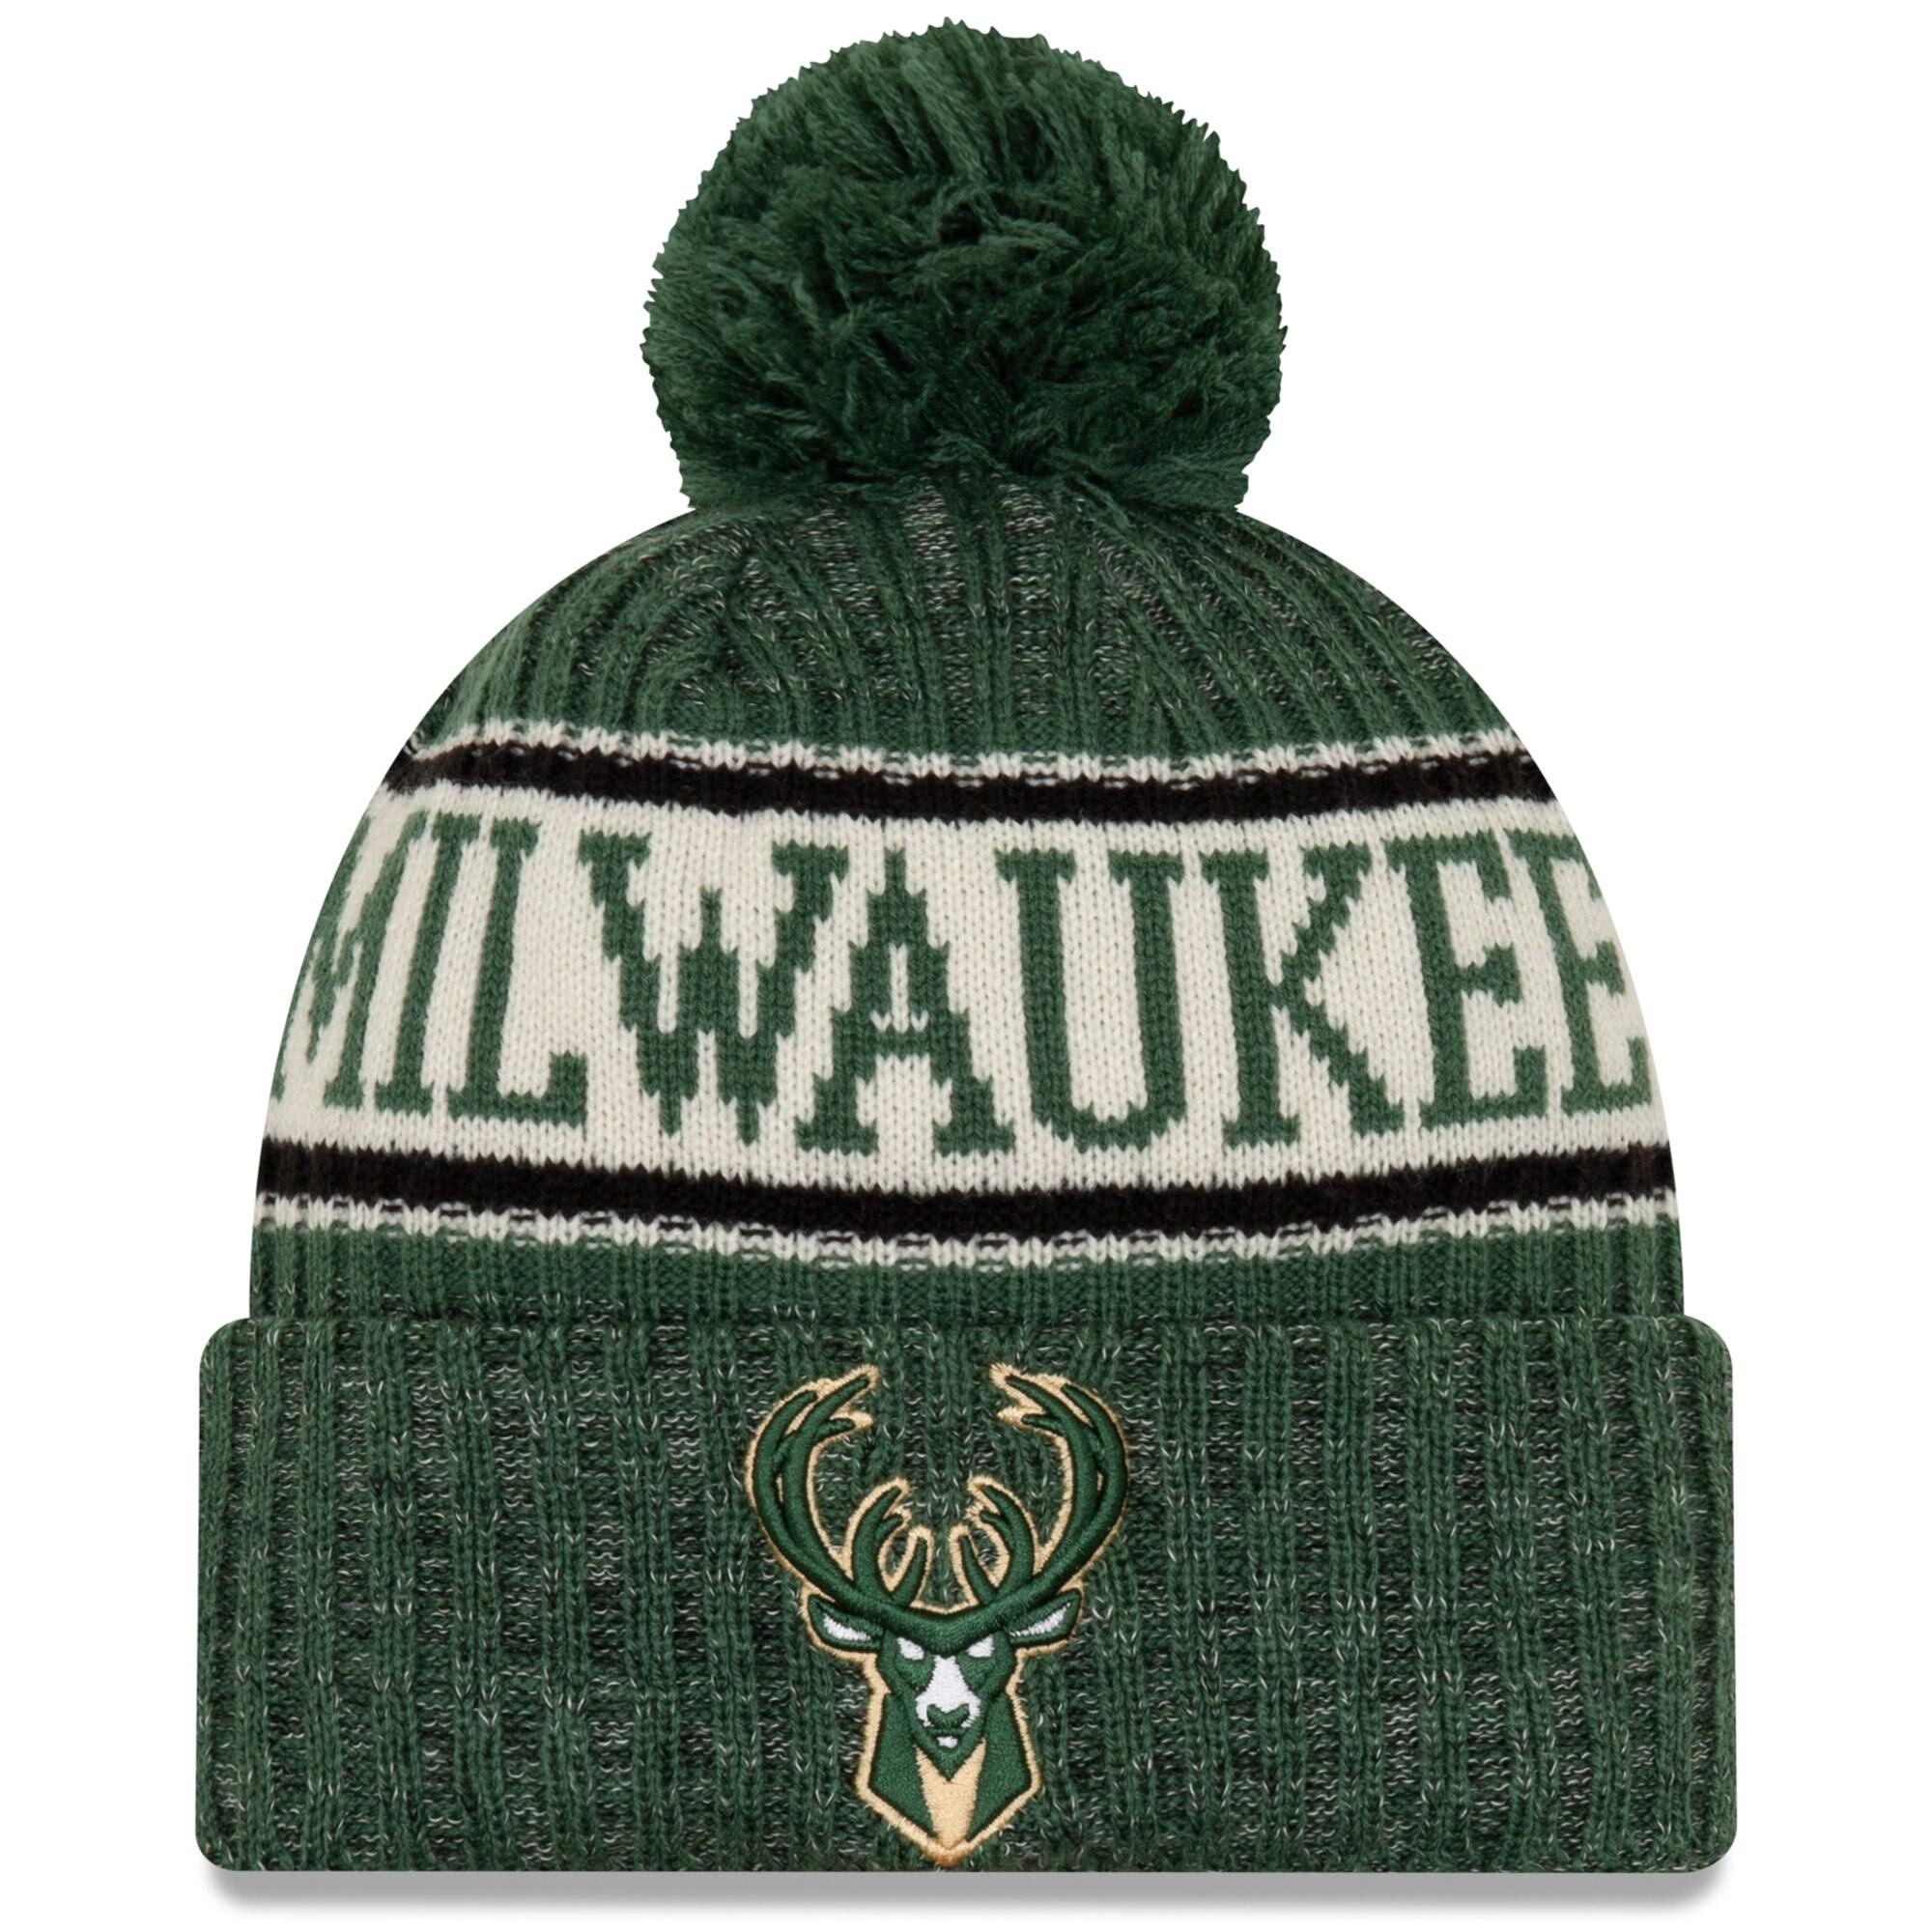 Milwaukee Bucks New Era Sport Cuffed Knit Hat with Pom - Hunter Green